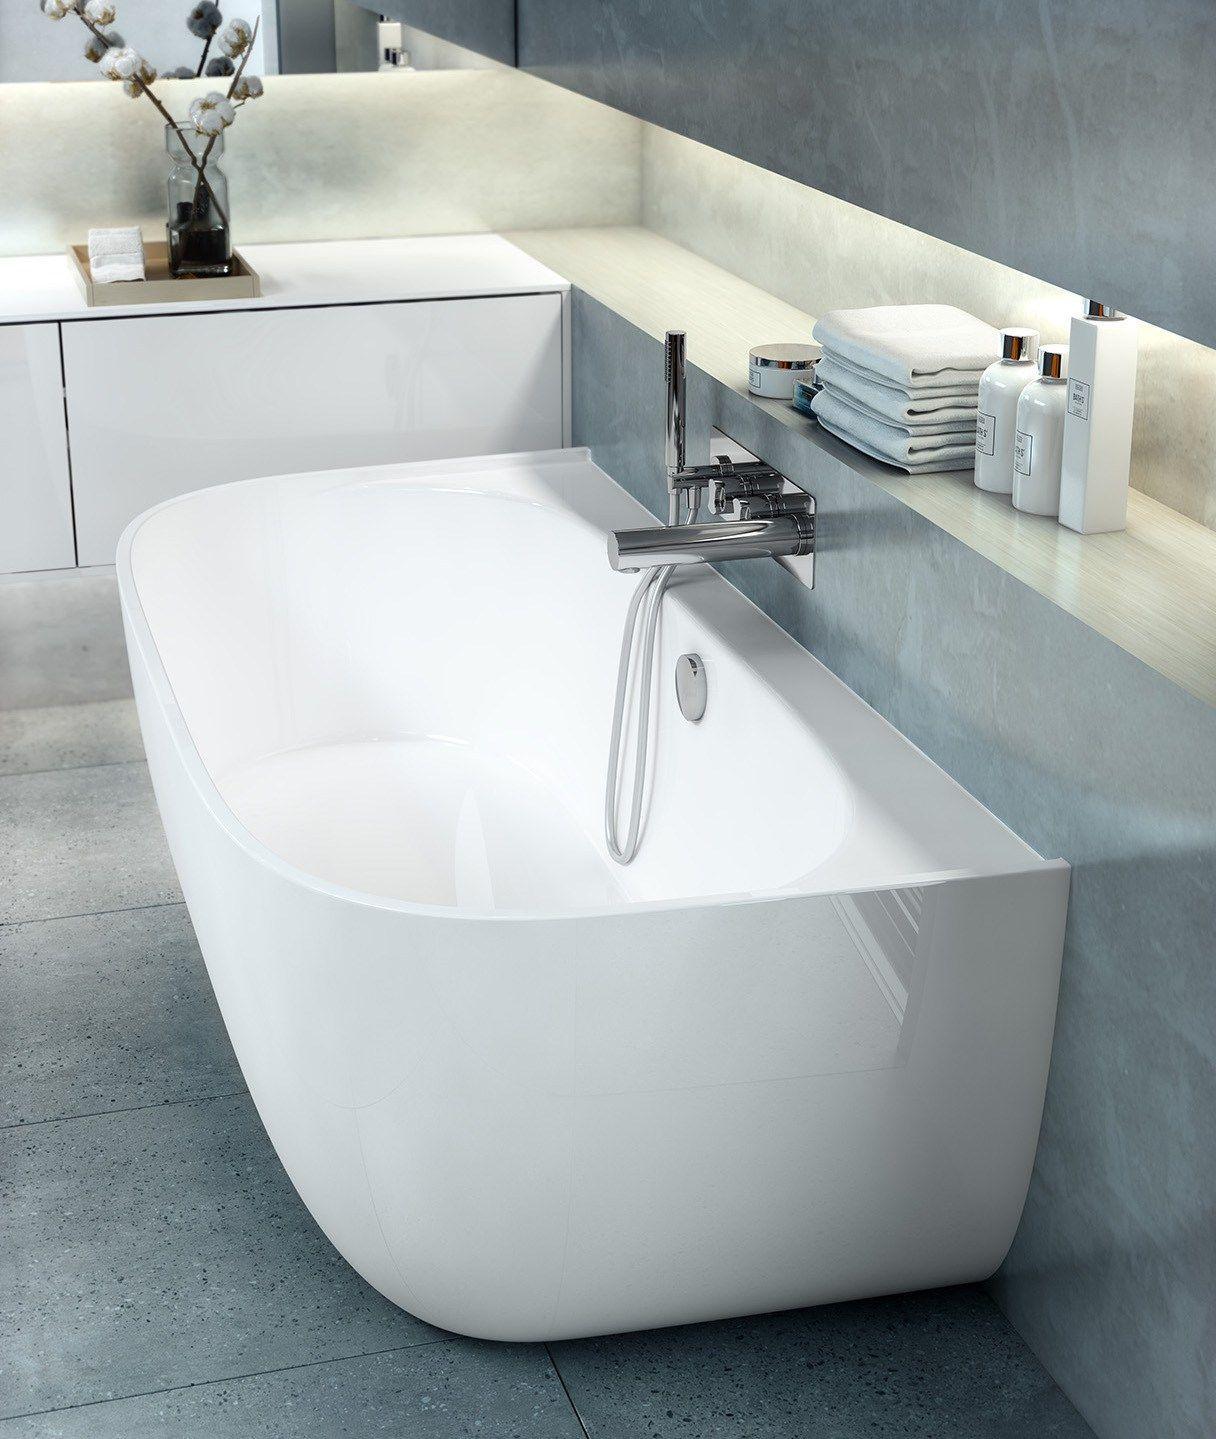 6 Simple Bathroom Collections For The Design Conscious Cate St Hill Simplebathroomdesigns Elon In 2020 Simple Bathroom Designs Bathroom Collections Simple Bathroom